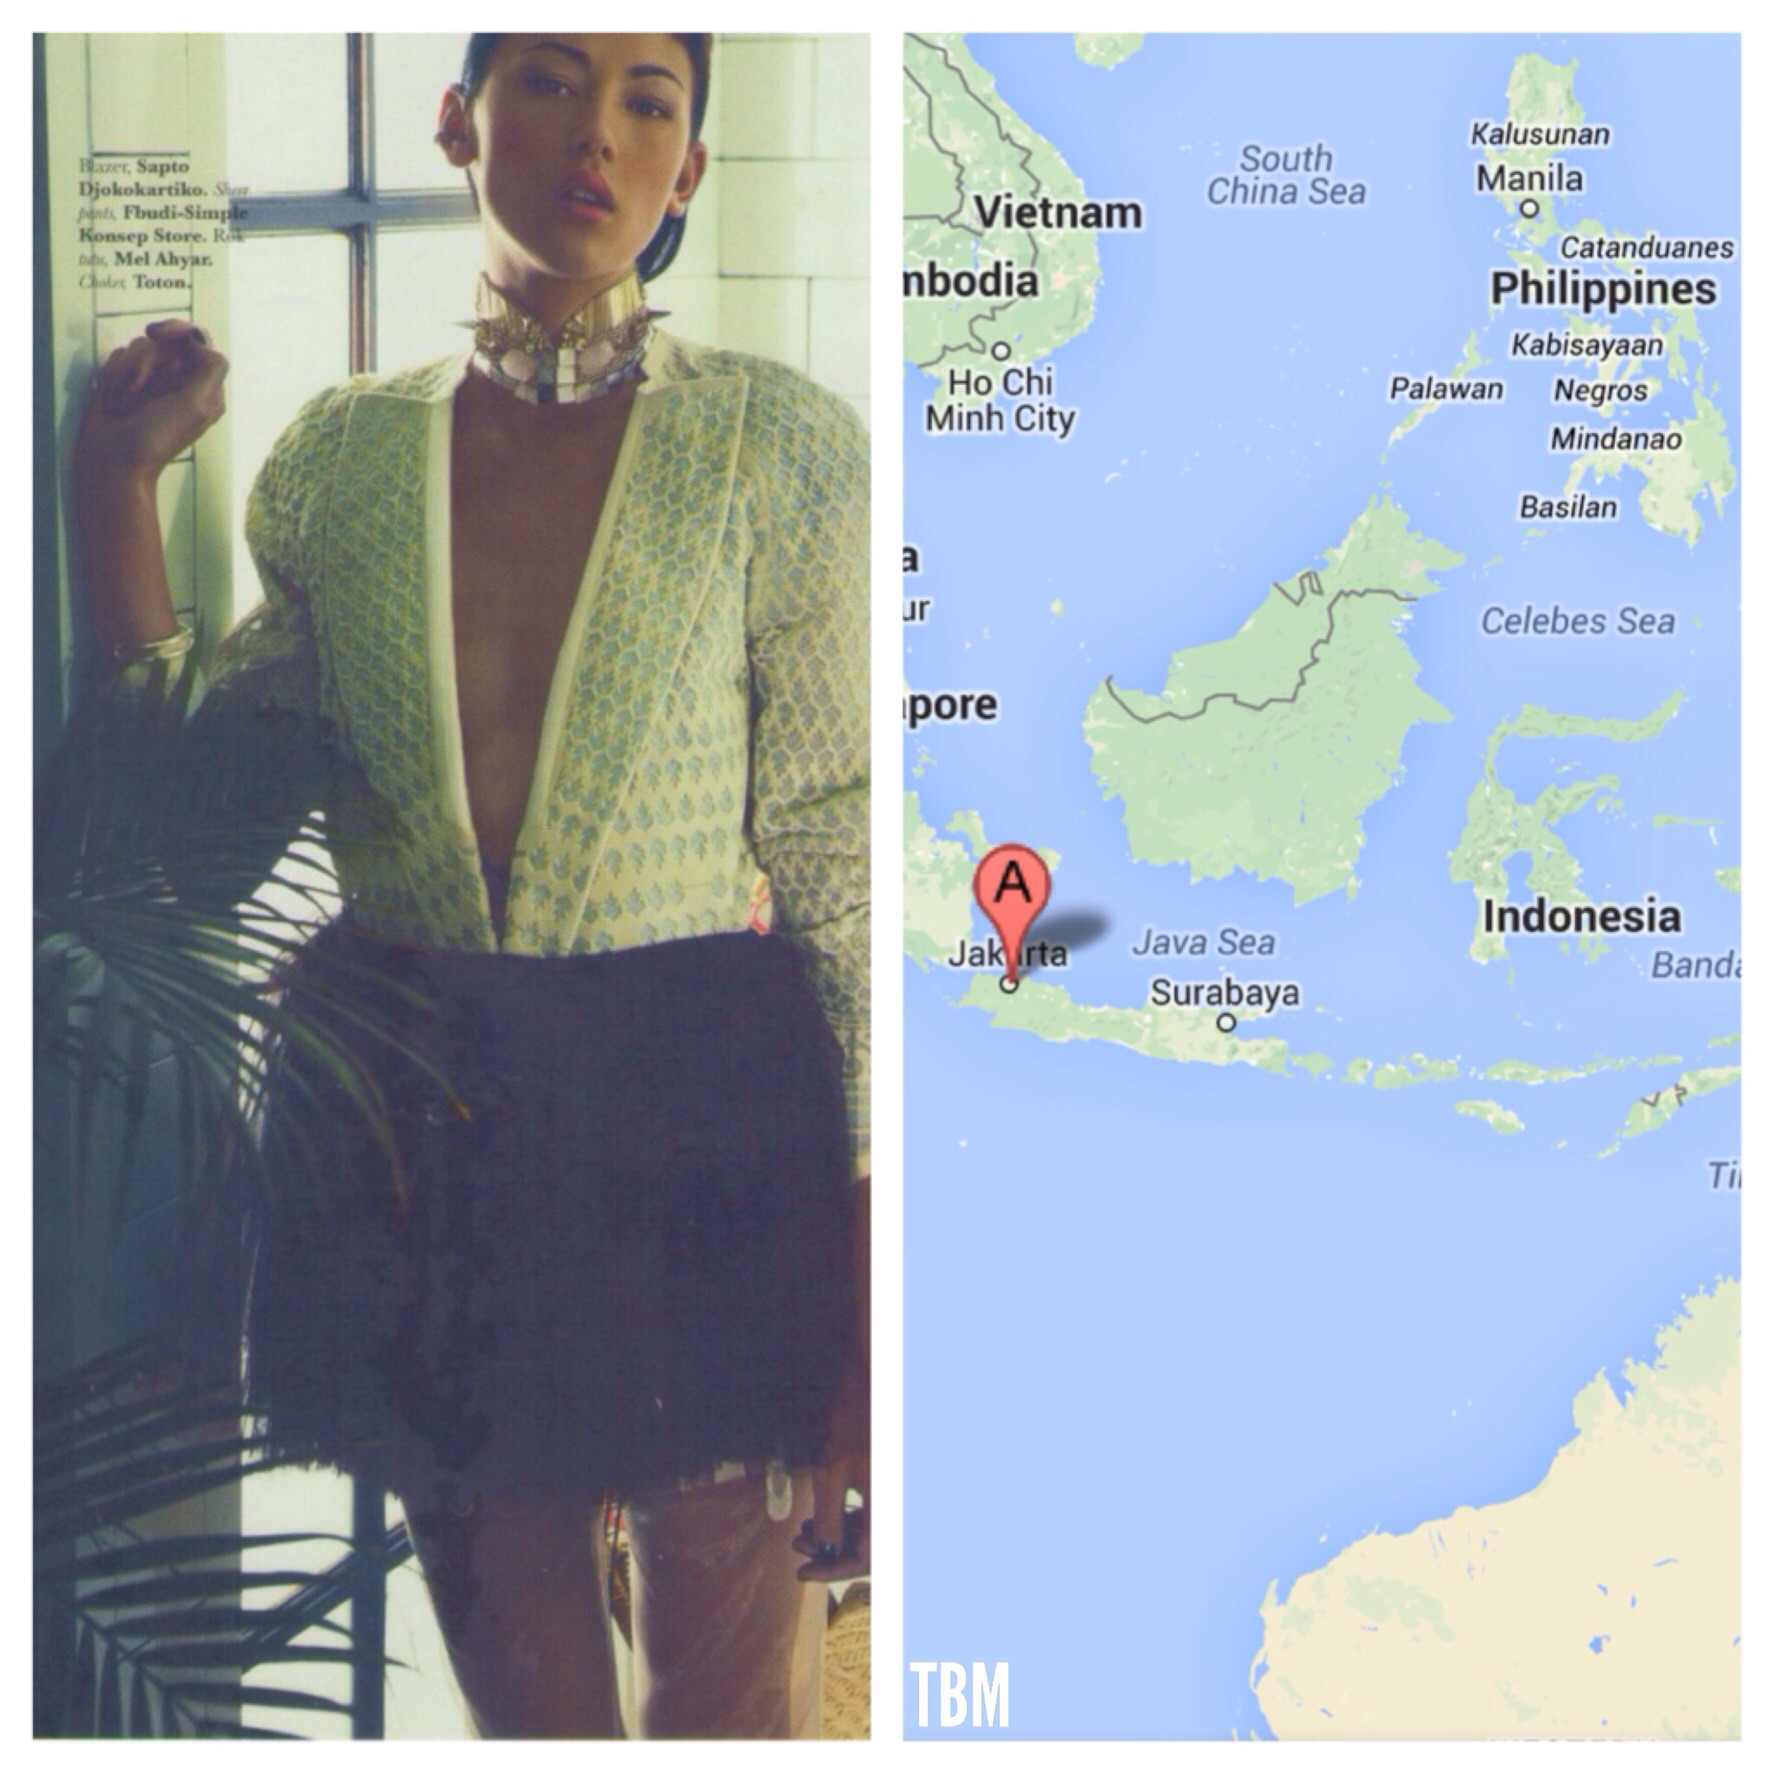 ELLE Indonesia by Jackie Suharto | Jakarta, Indonesia via Google Maps